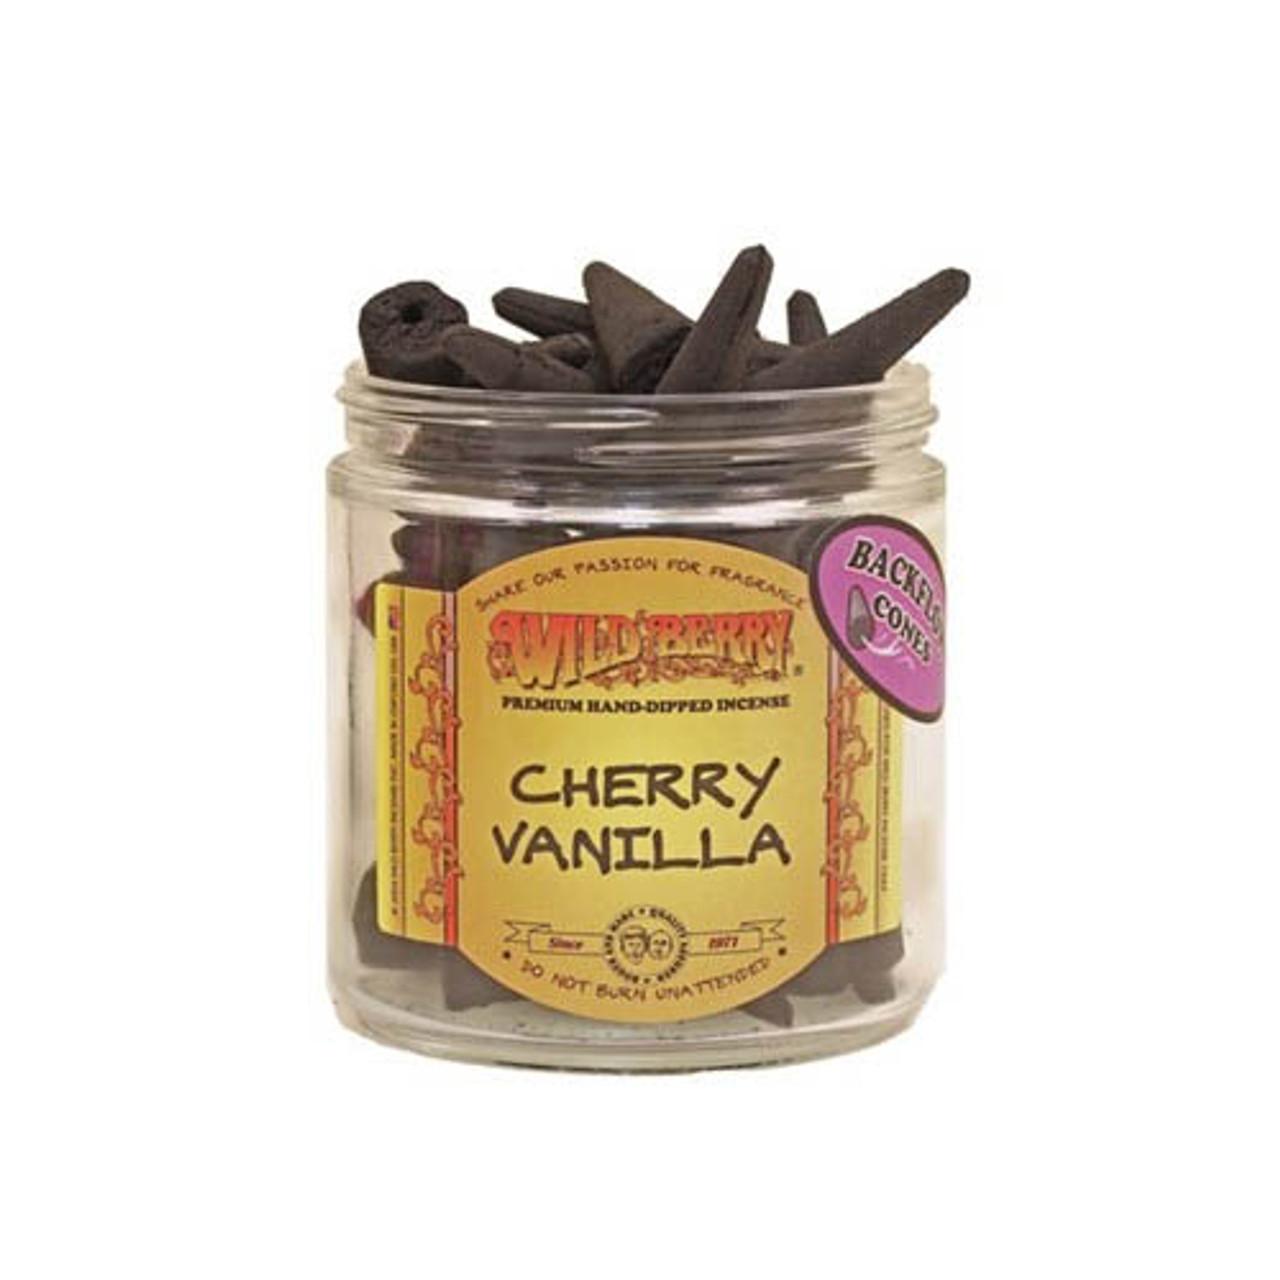 Wild Berry Incense Backflow Cones (Bag of 25)